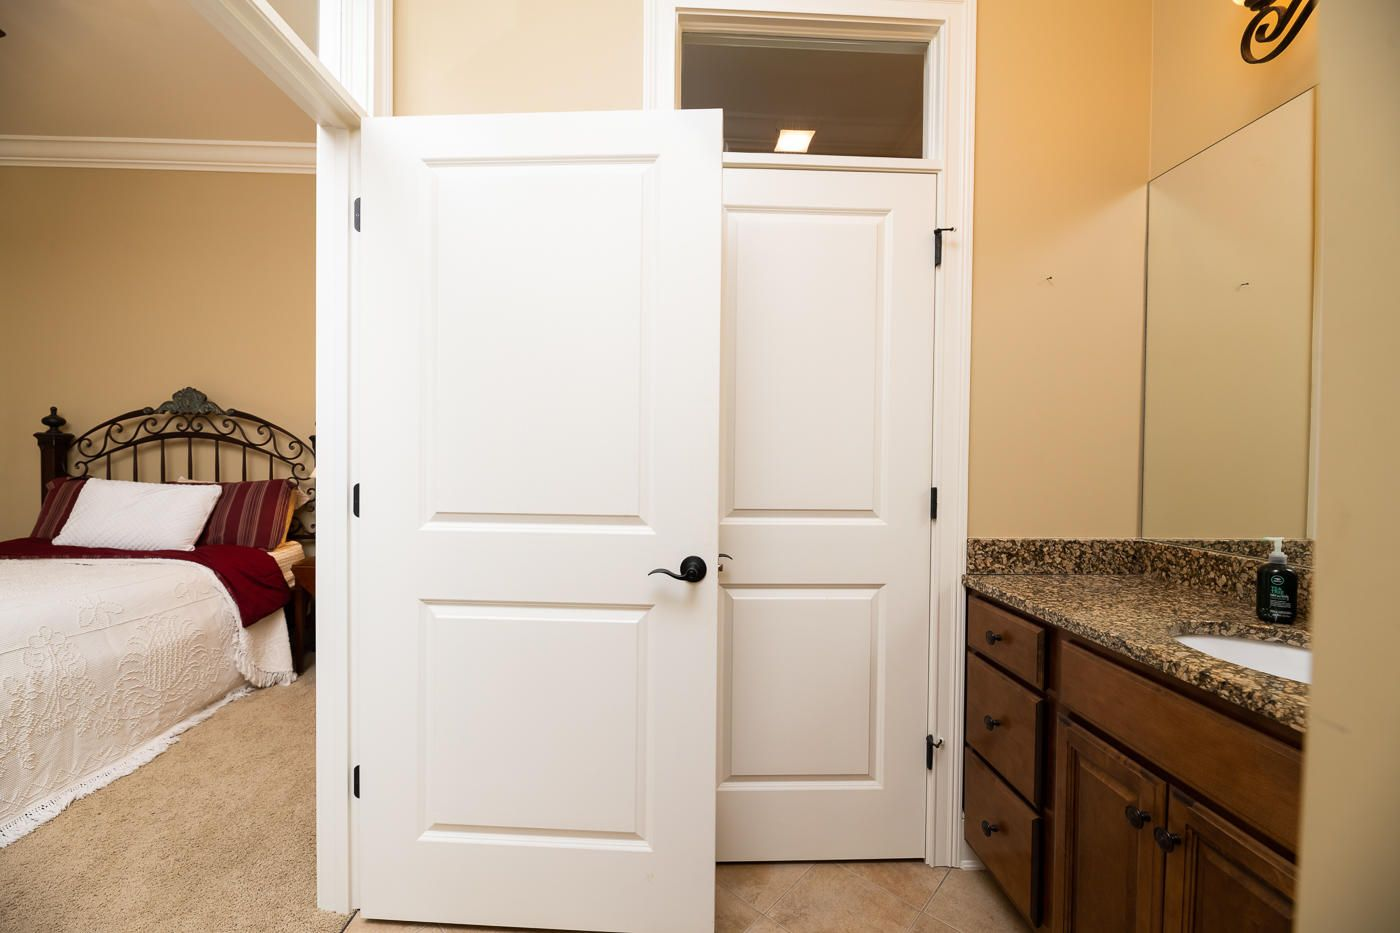 2nd Bedroom's Bathroom